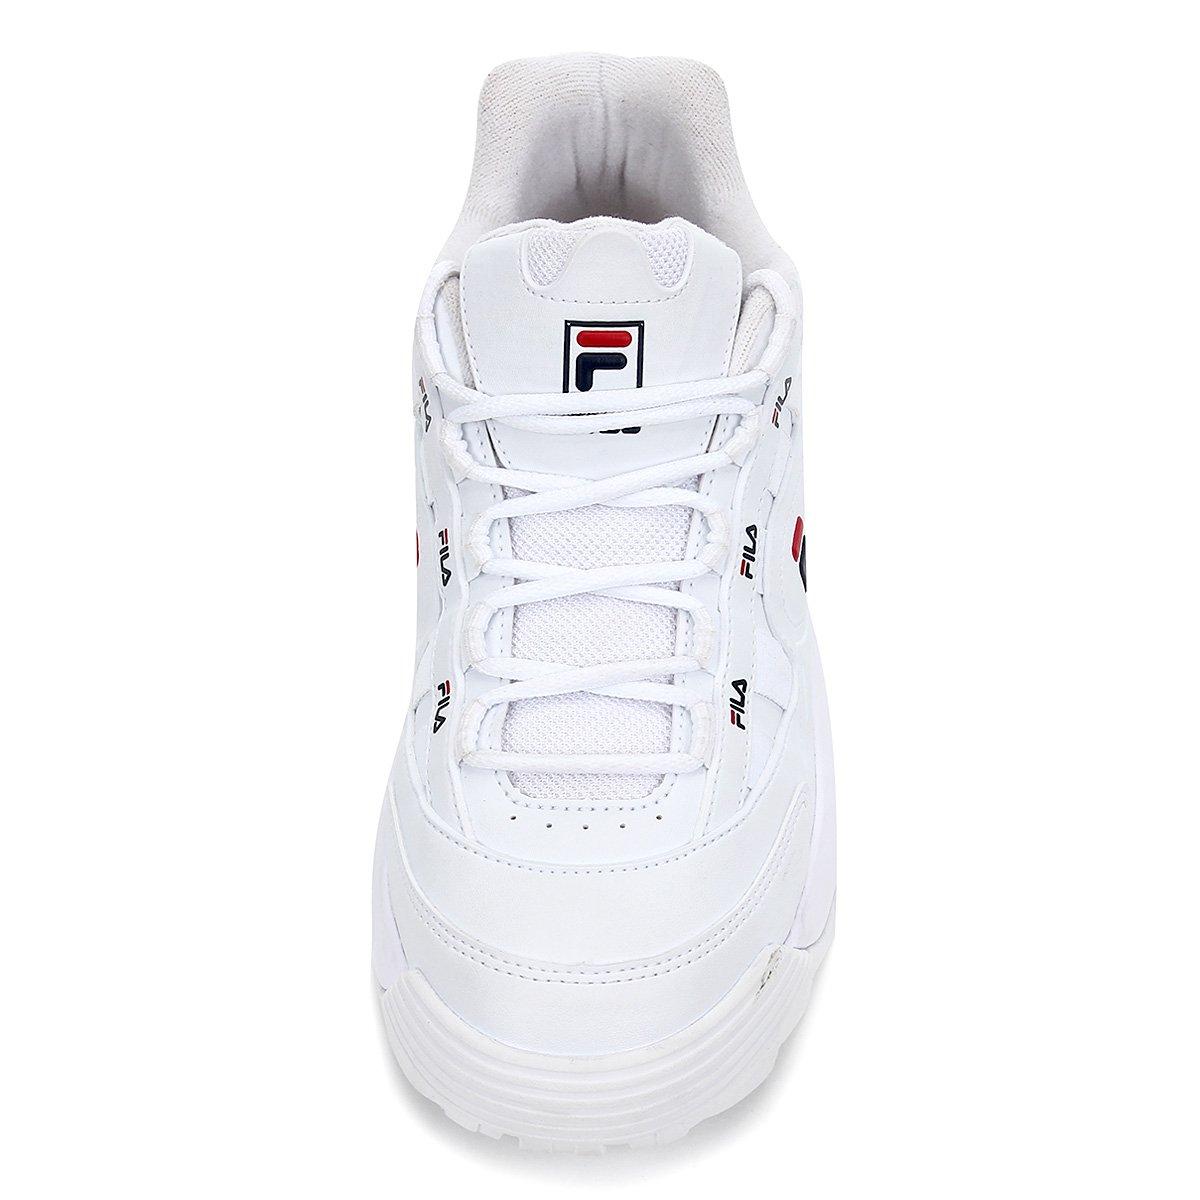 Tênis Fila D-Formation Masculino Branco/Vermelho